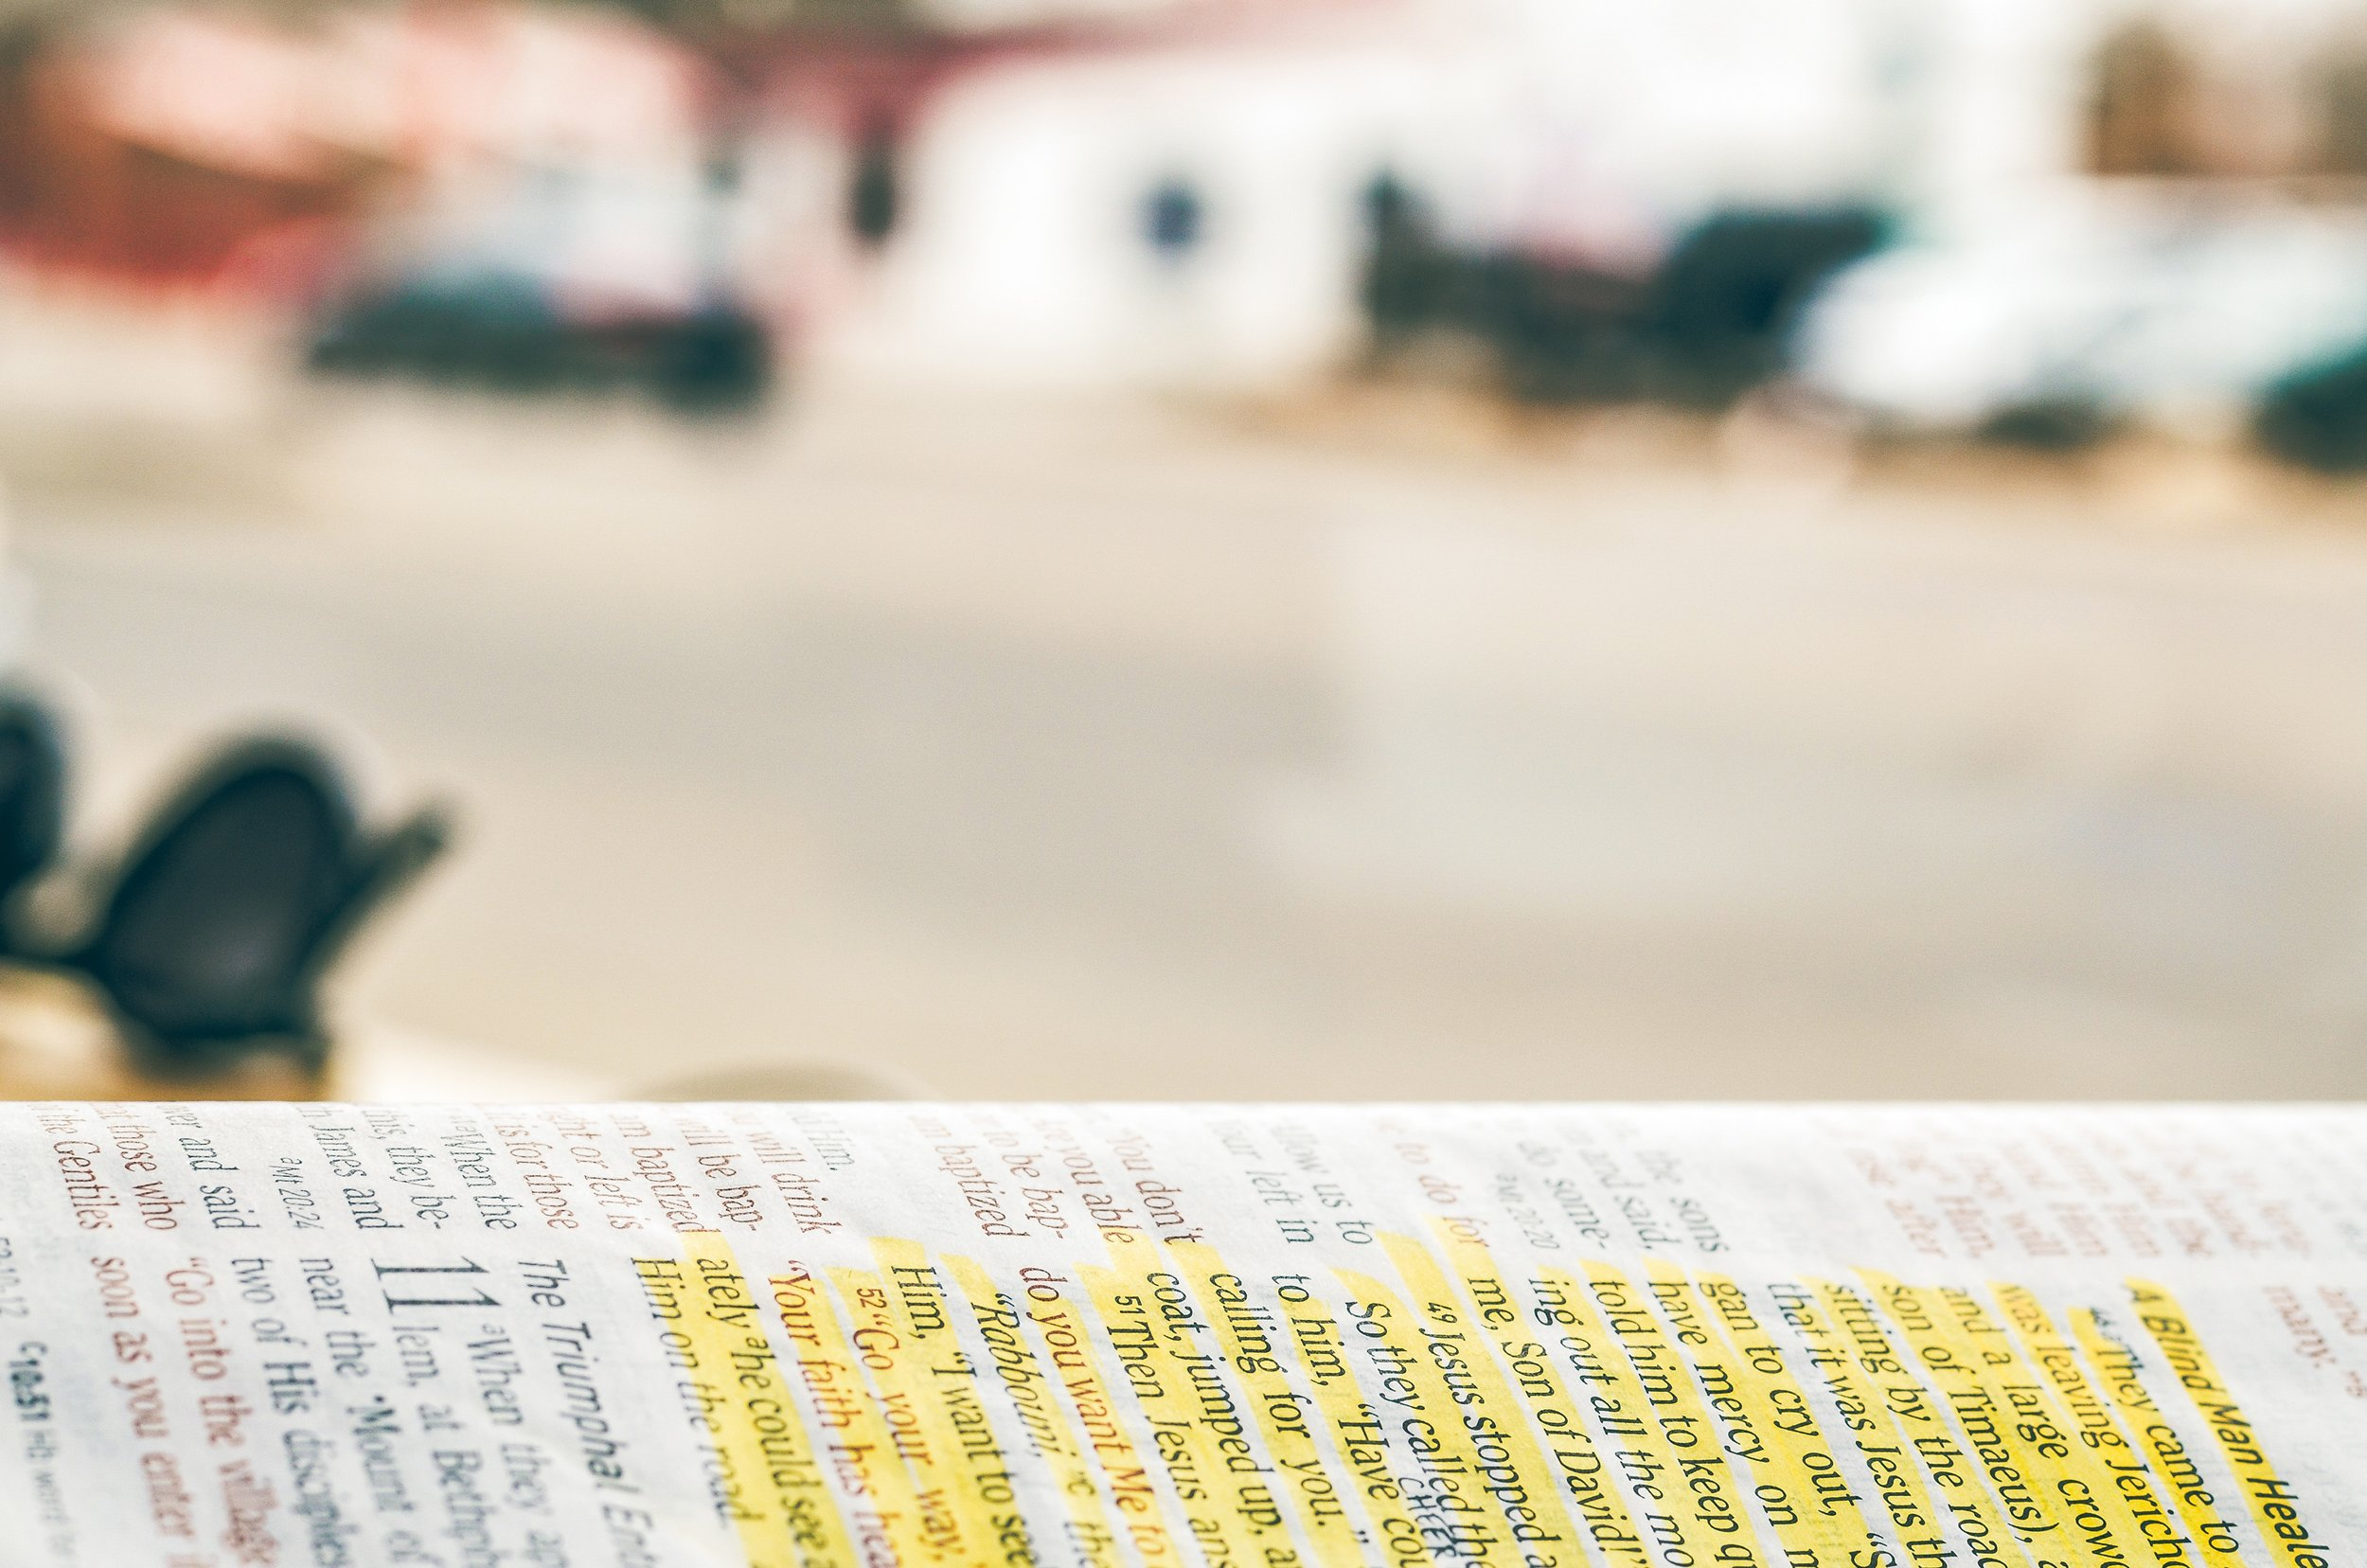 bible-blur-close-up-895449.jpg